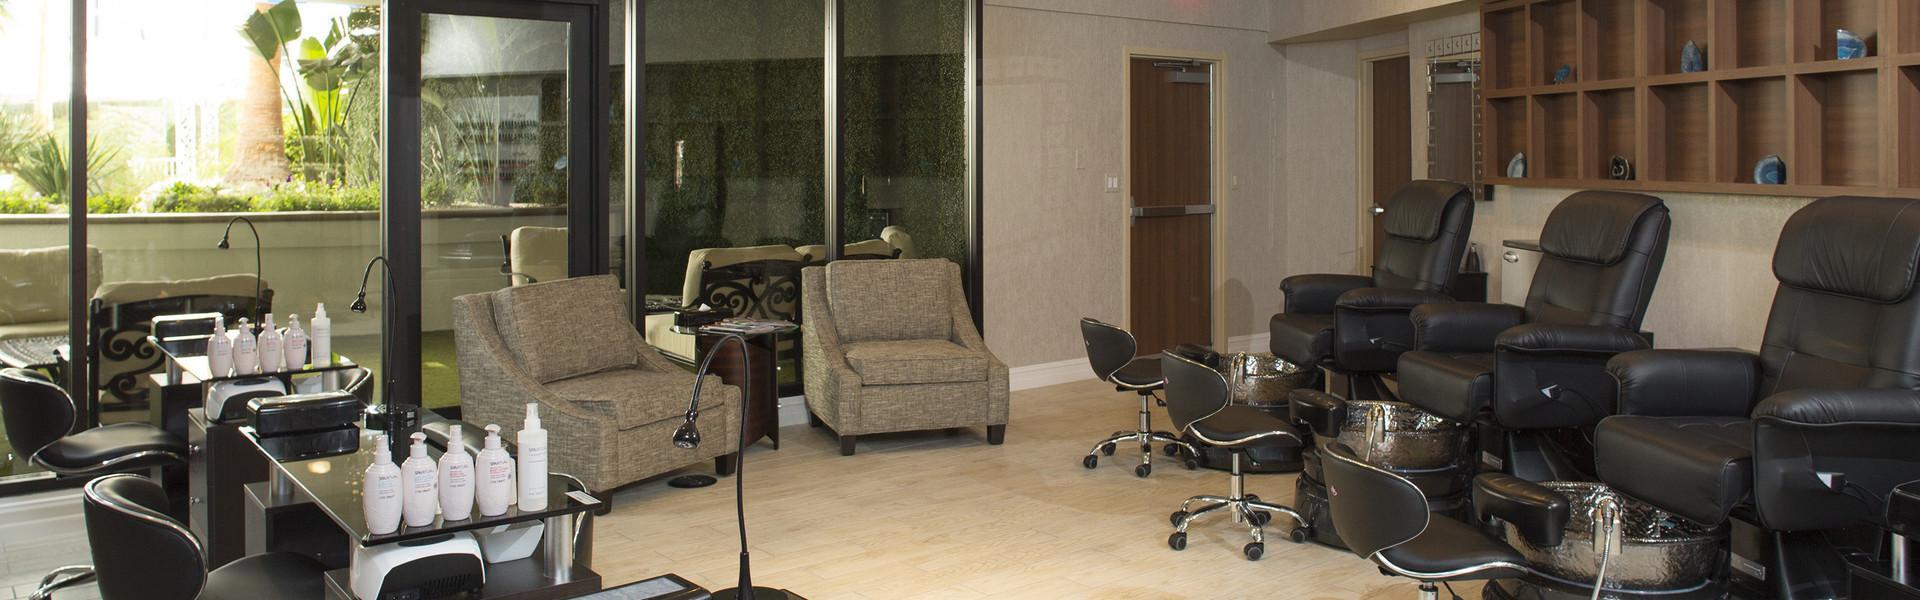 Salon at our Las Vegas Hotel and Casino | iBlowdry Salon